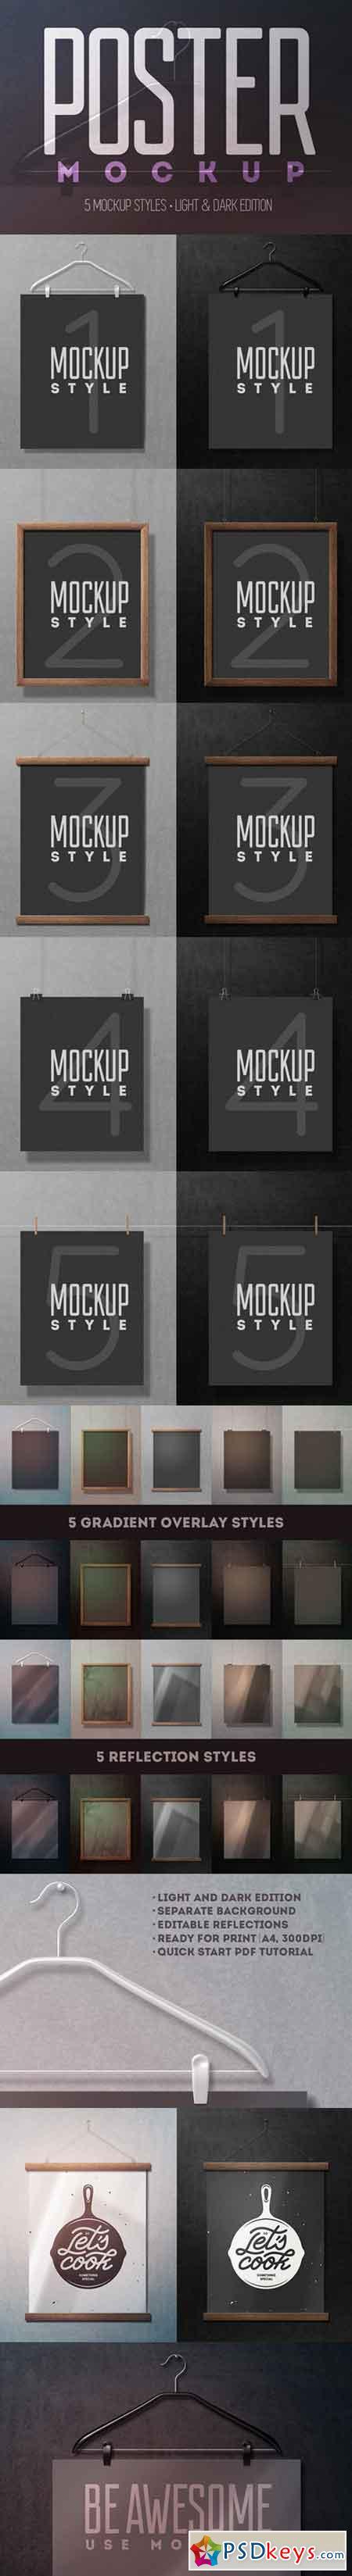 Poster Mockup 899390